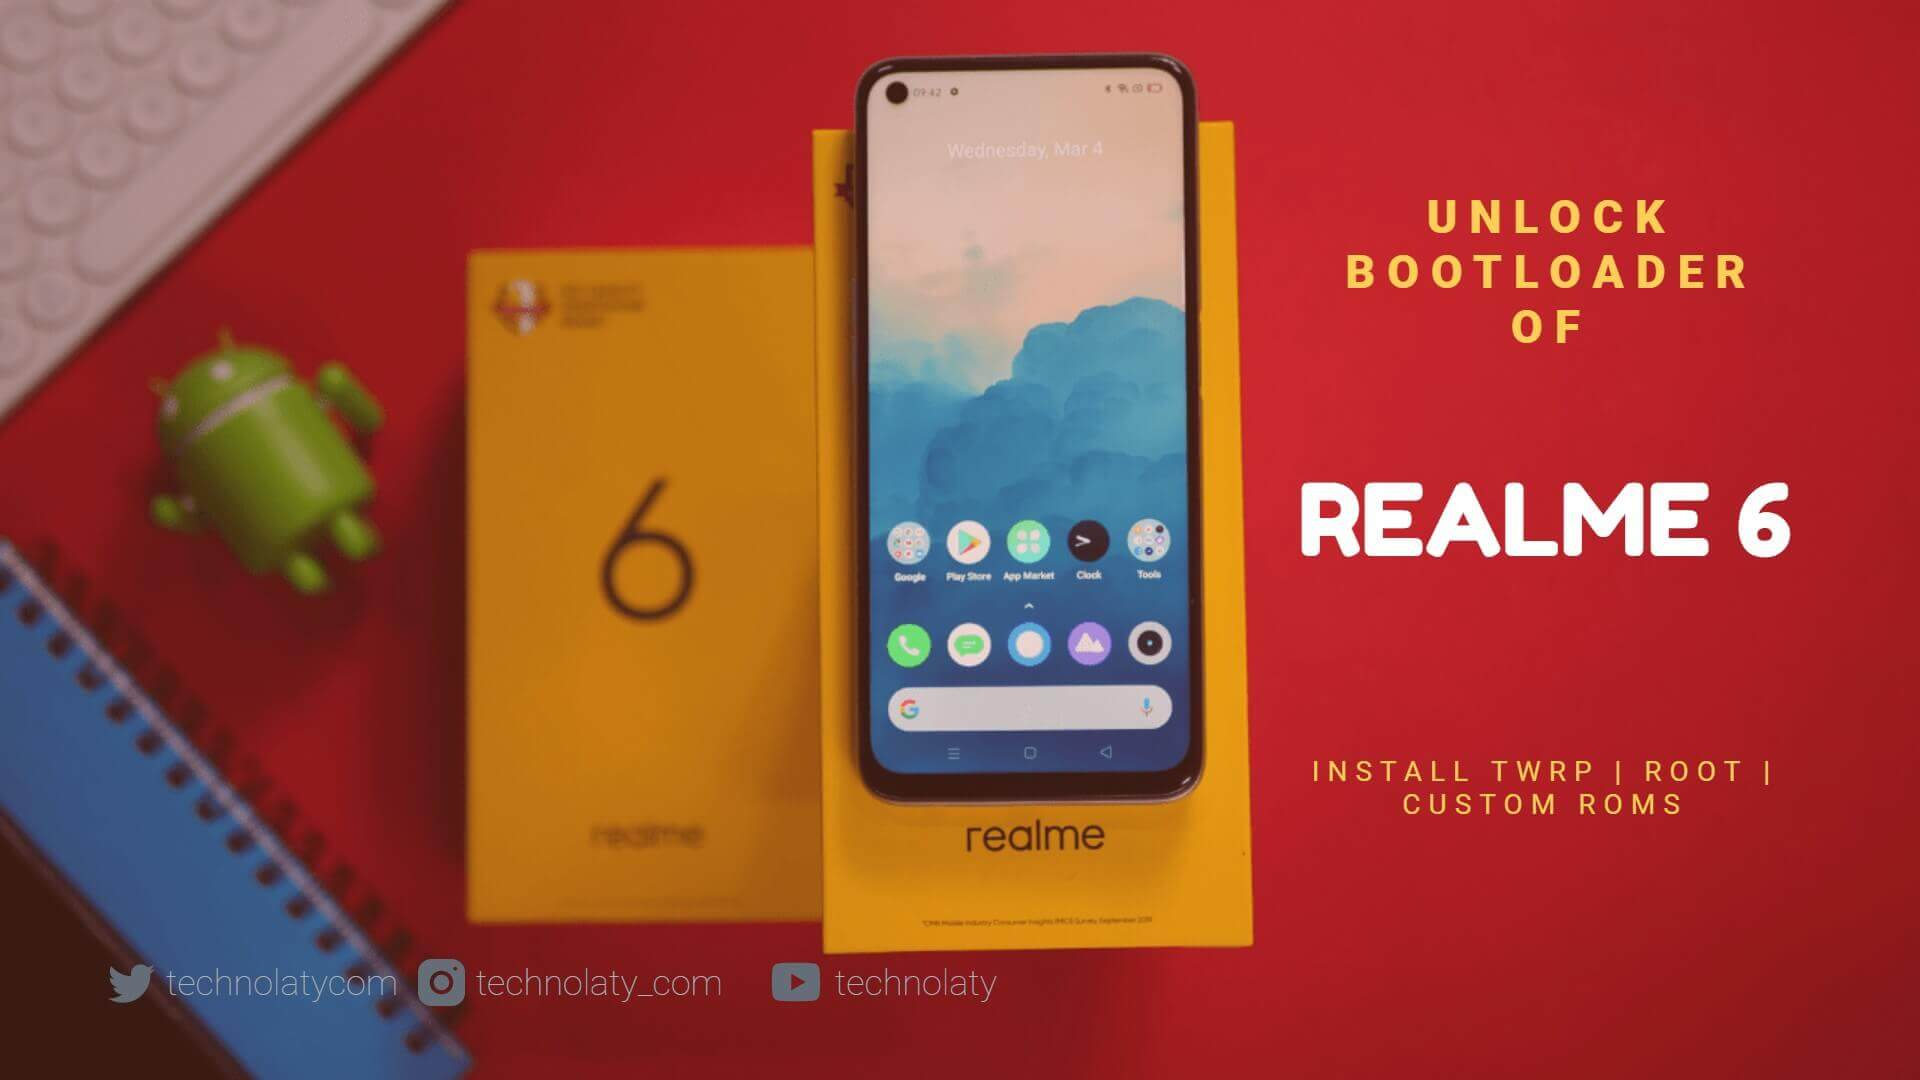 Realme 6 Bootloader Unlocking Guide